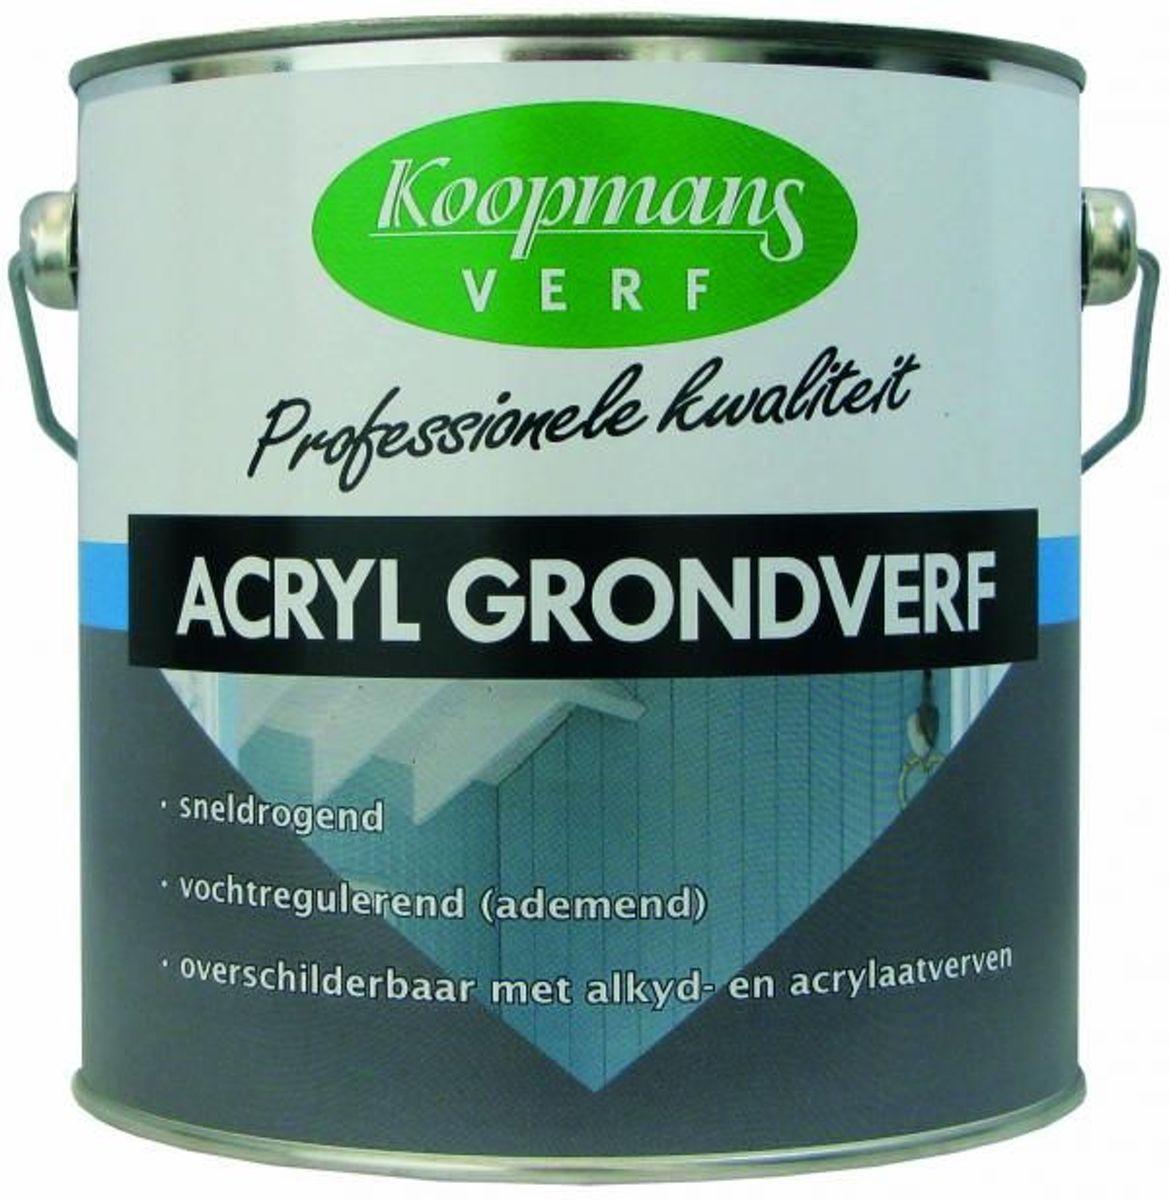 Koopmans Acryl Grondverf 2,5ltr Wit